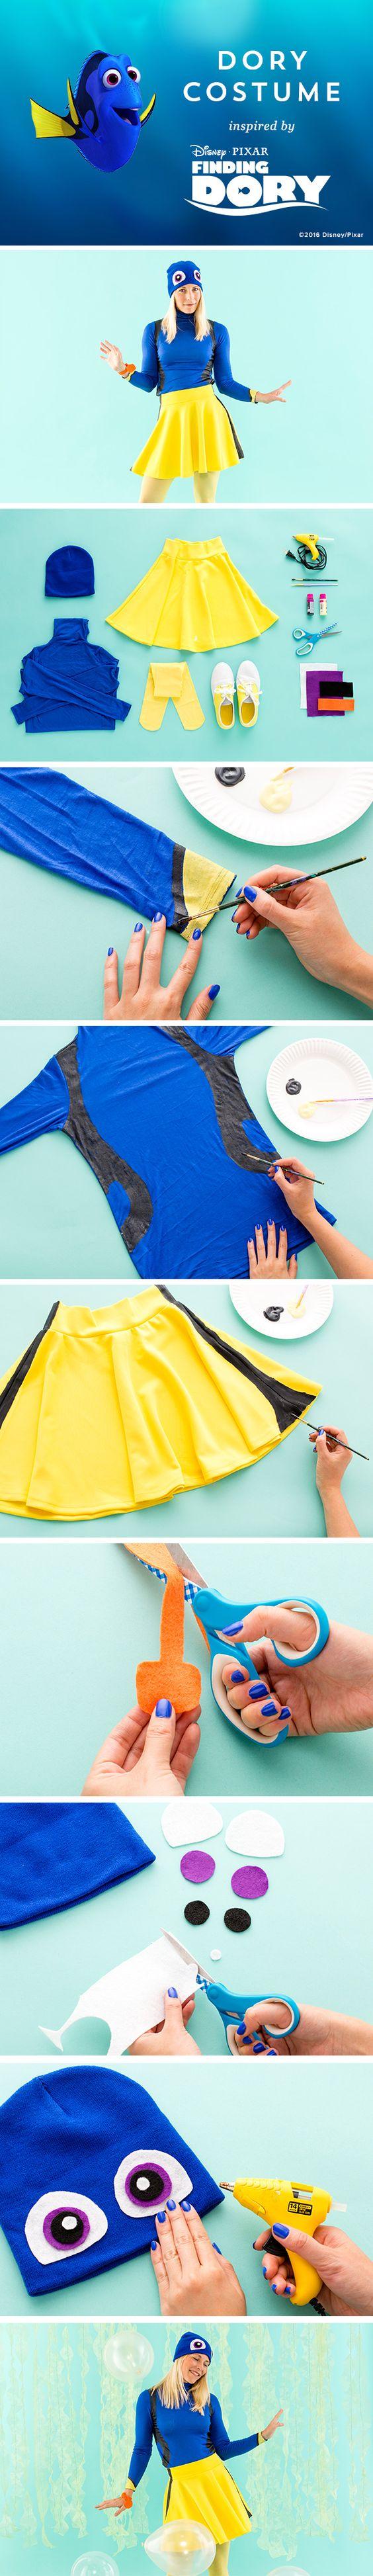 DIY Dory Costume.